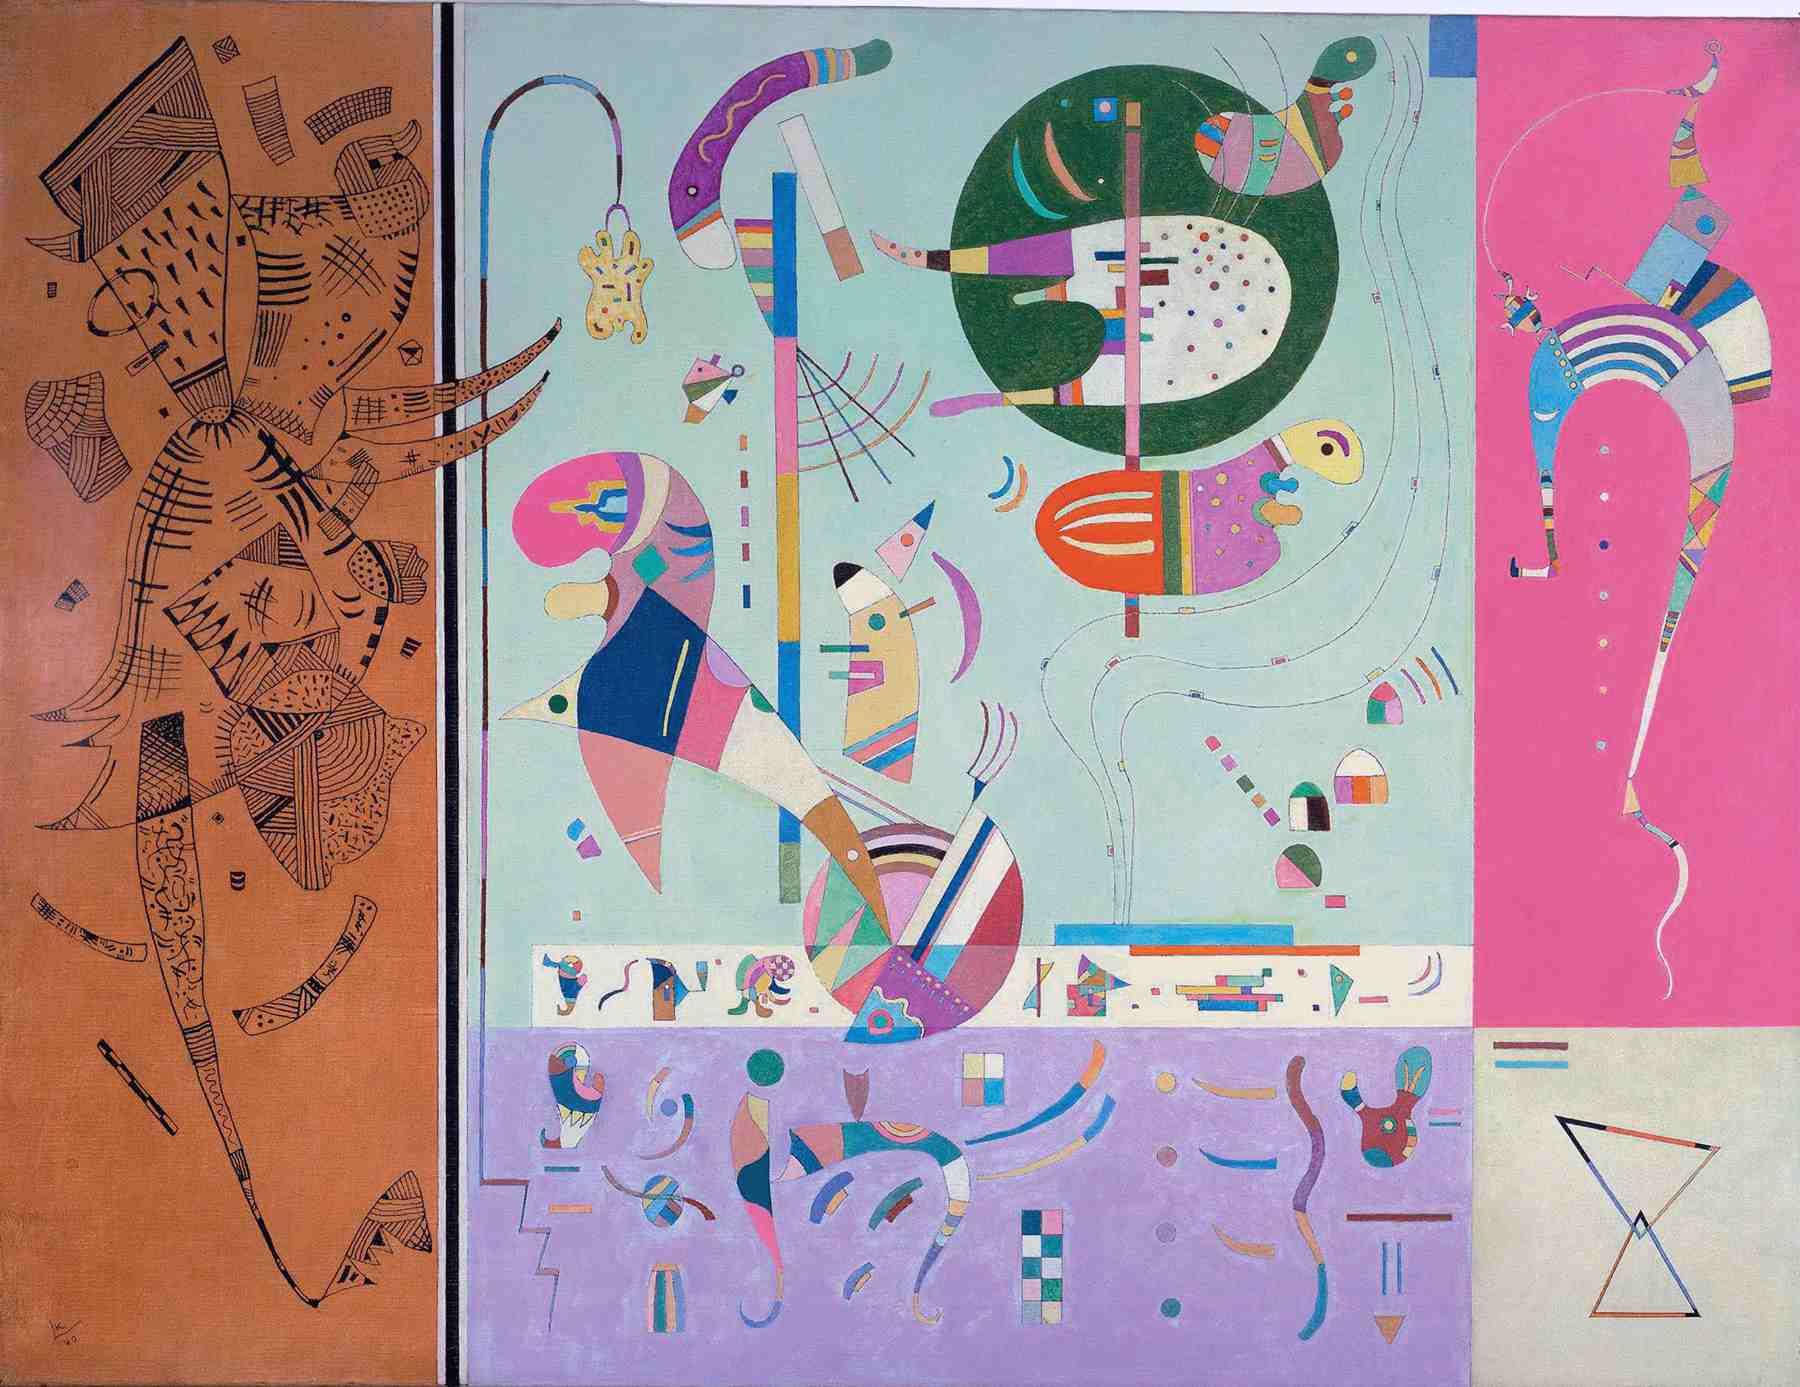 Wassily Kandinsky (Russian, 1866-1944) Wassily Kandinsky (Russian, 1866-1944). Various Parts (Parties diverses), February 1940. Oil on canvas. 35 x 45 5/8 in. (89 x 116 cm). Gabriele Münter and Johannes Eichner-Stiftung, Munich. On deposit at the Städtische Galerie im Lenbachhaus, Munich.